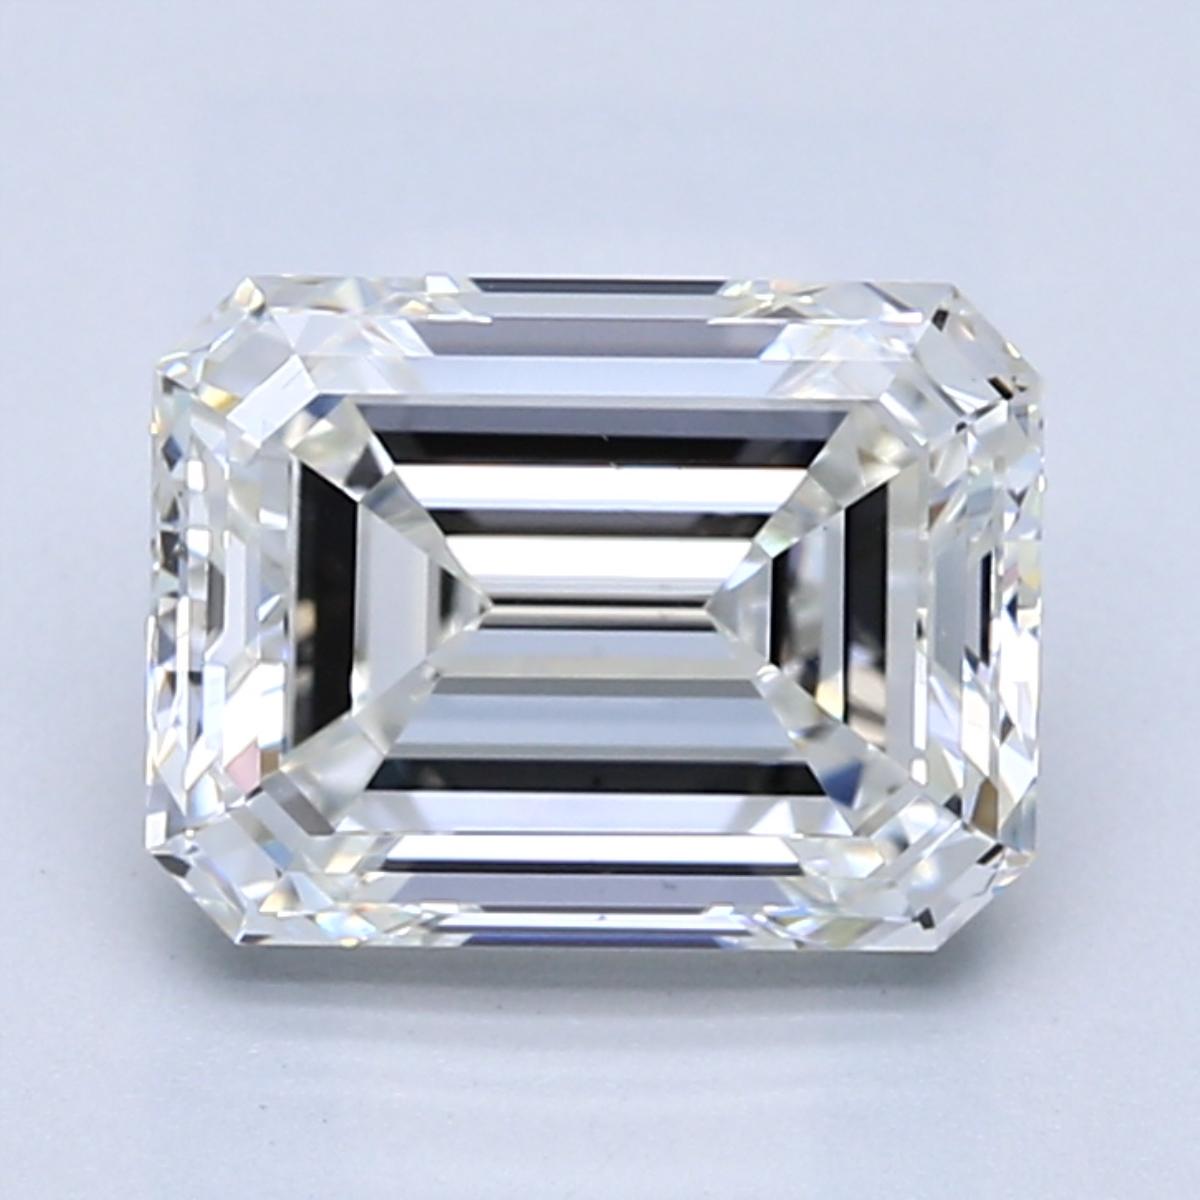 2.60 carat Emerald Diamond, Very Good cut, graded by the GIA laboratories.